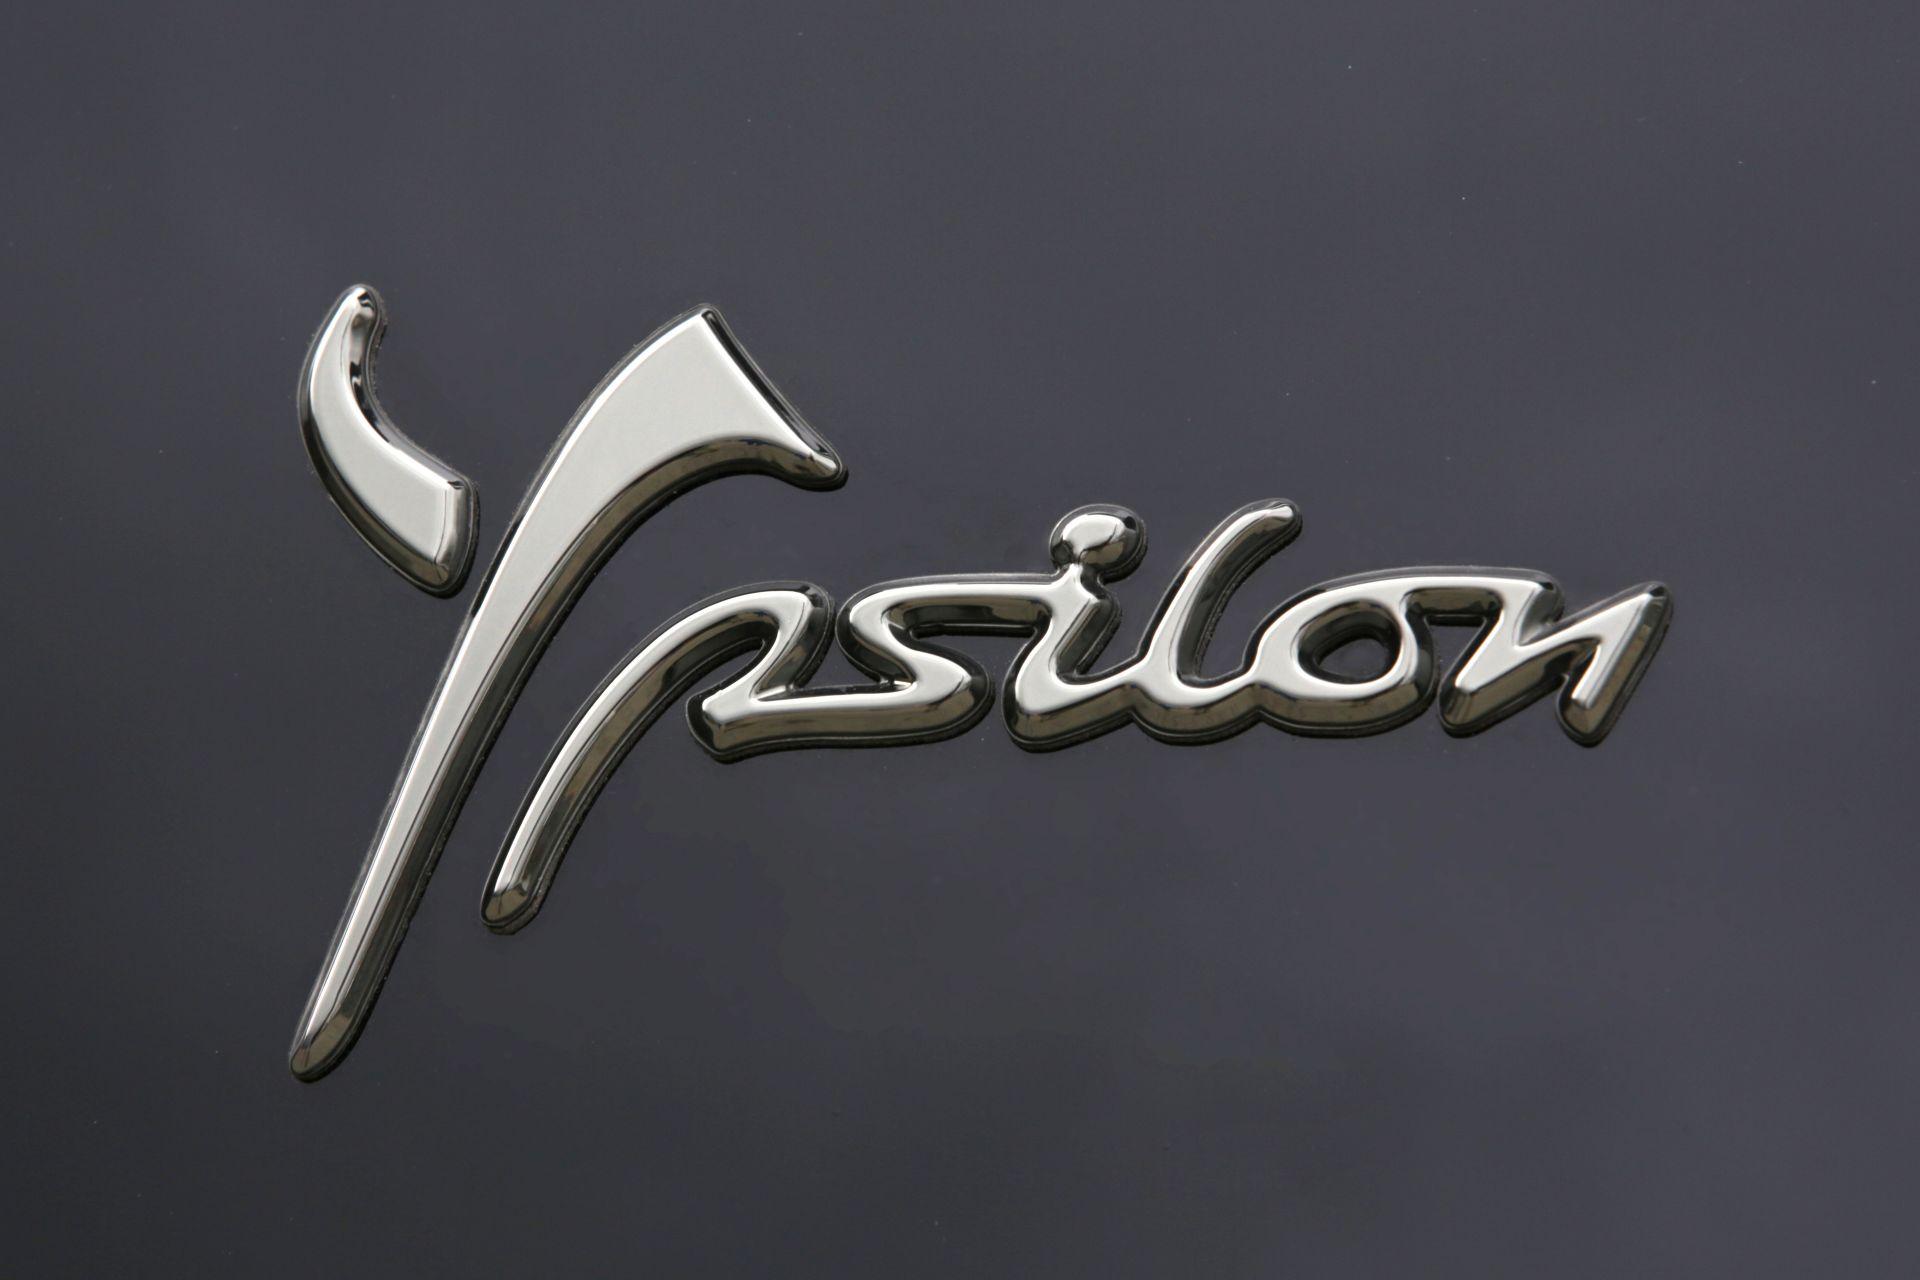 Lancia_Ypsilon_Hybrid_EcoChic_0017